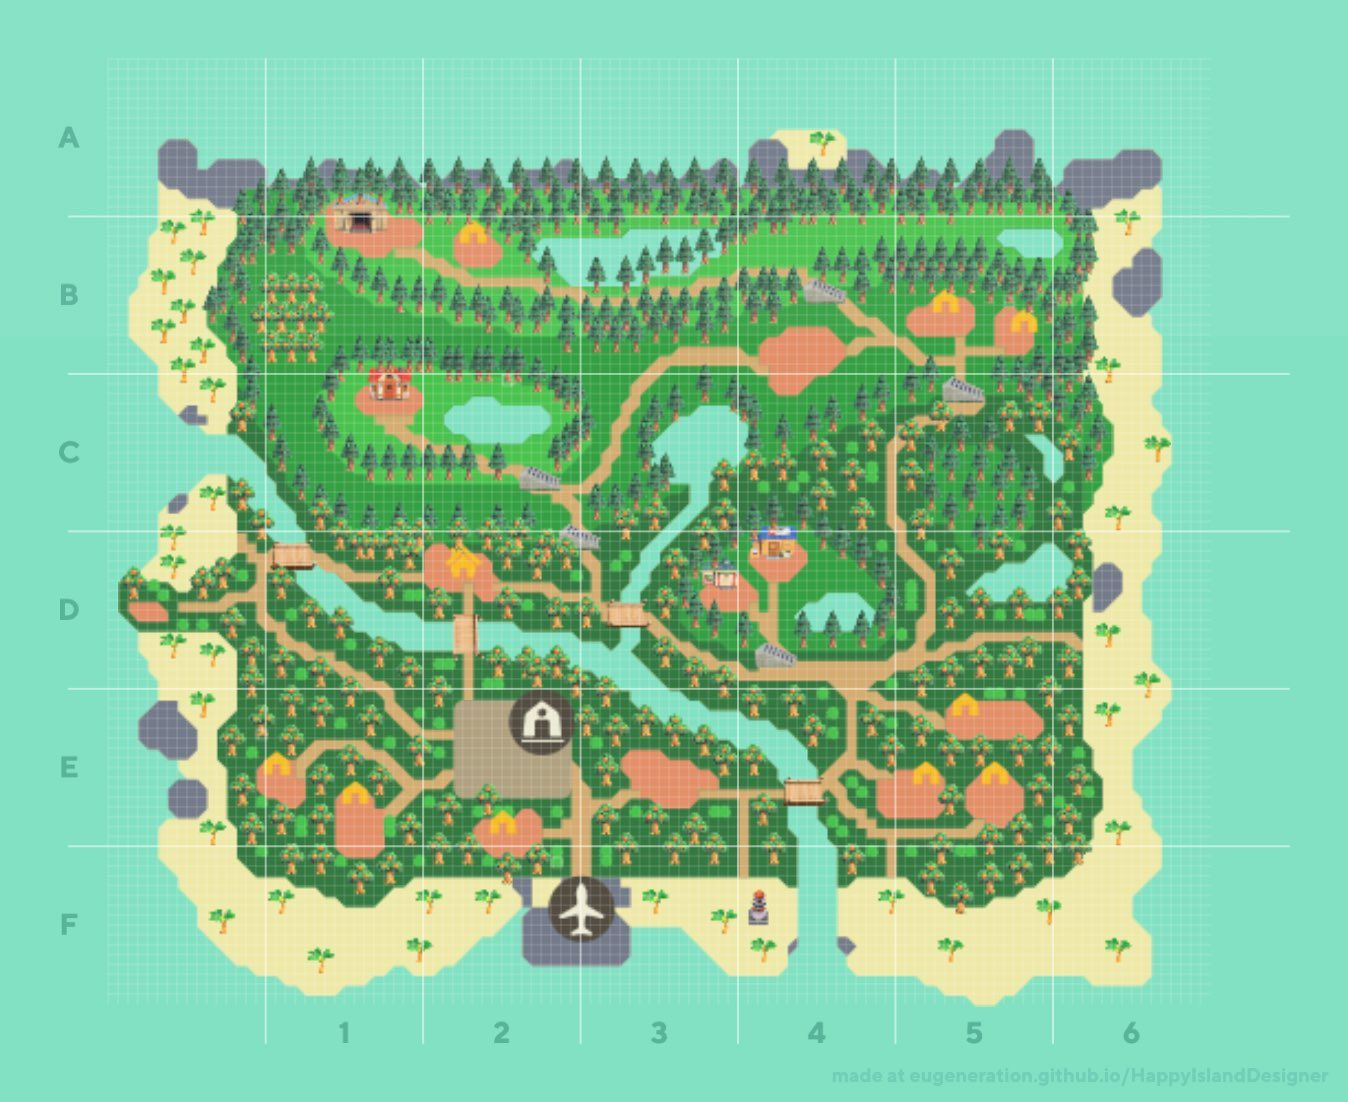 16+ Animal crossing new horizons map options ideas